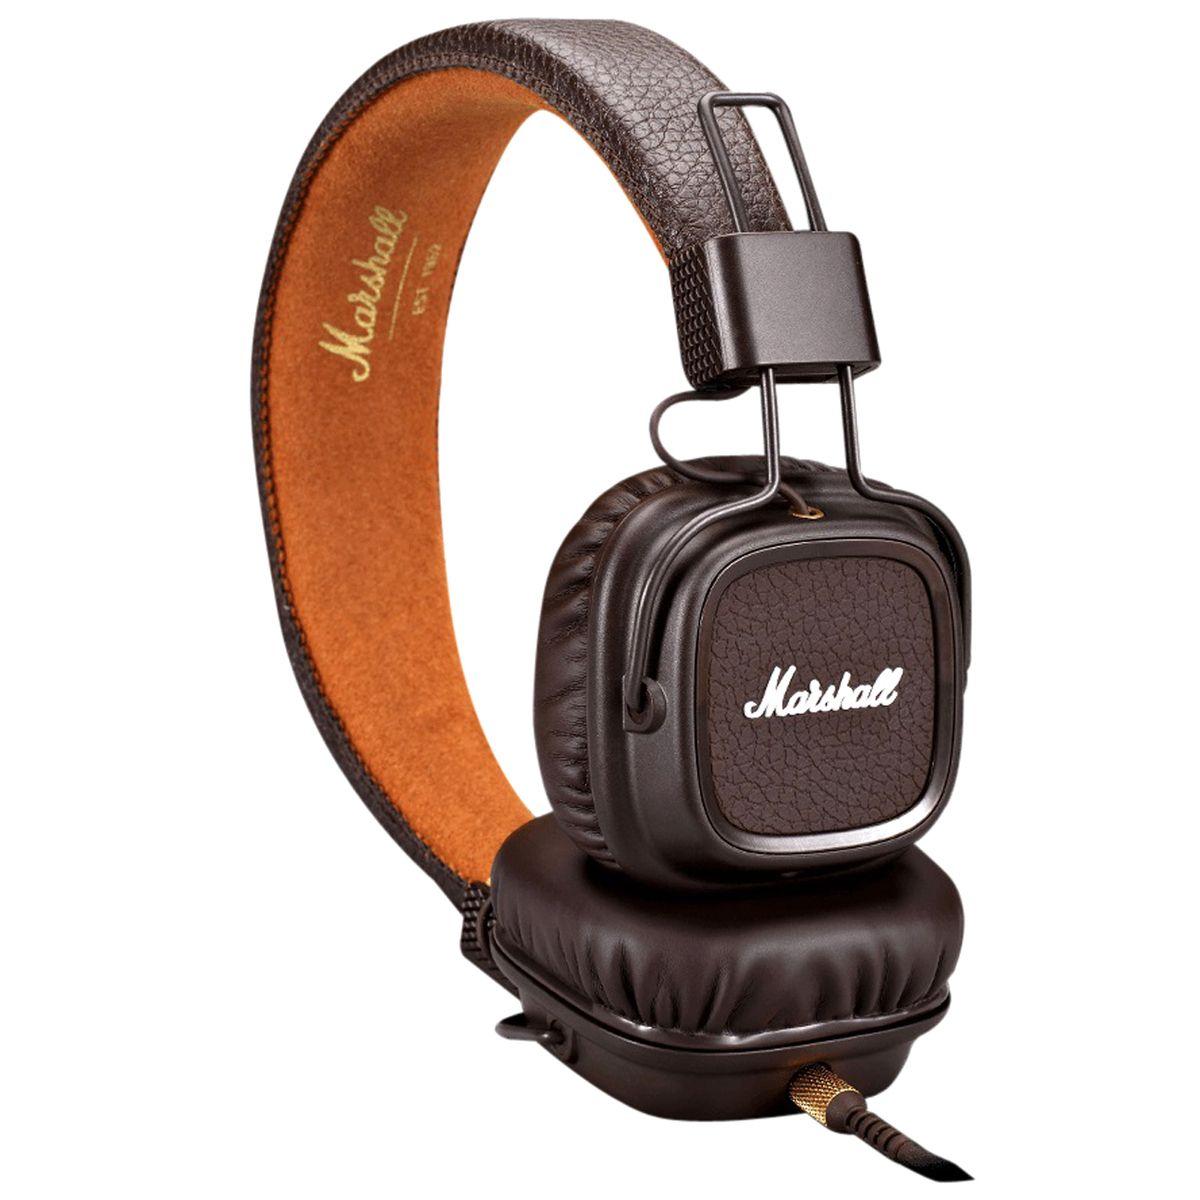 Casque audio filaire - Marron - Major III